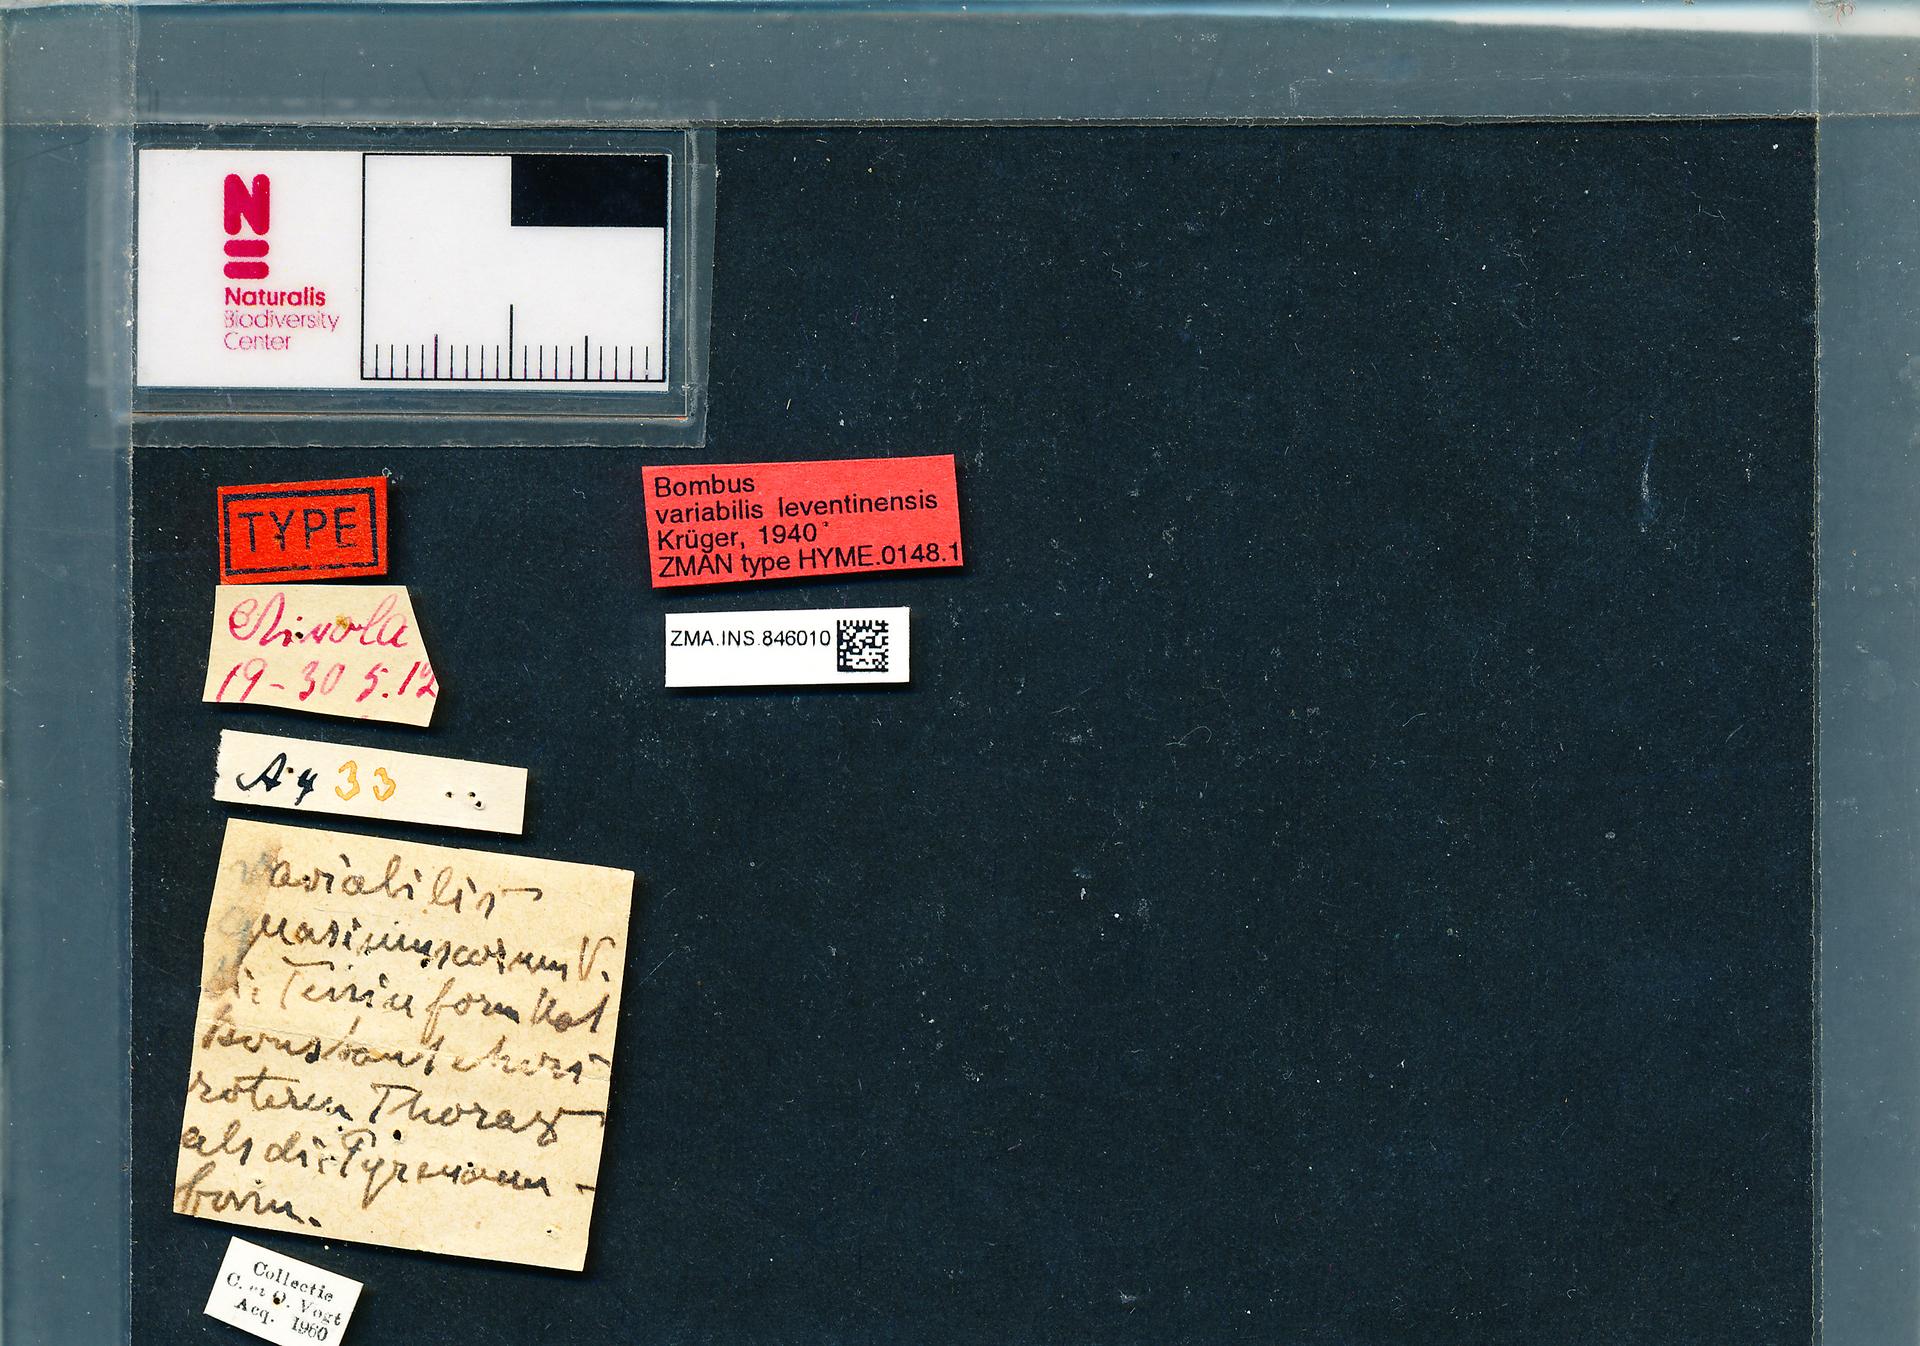 ZMA.INS.846010 | Bombus (Thoracobombus) humilis sordidus Krüger, 1940